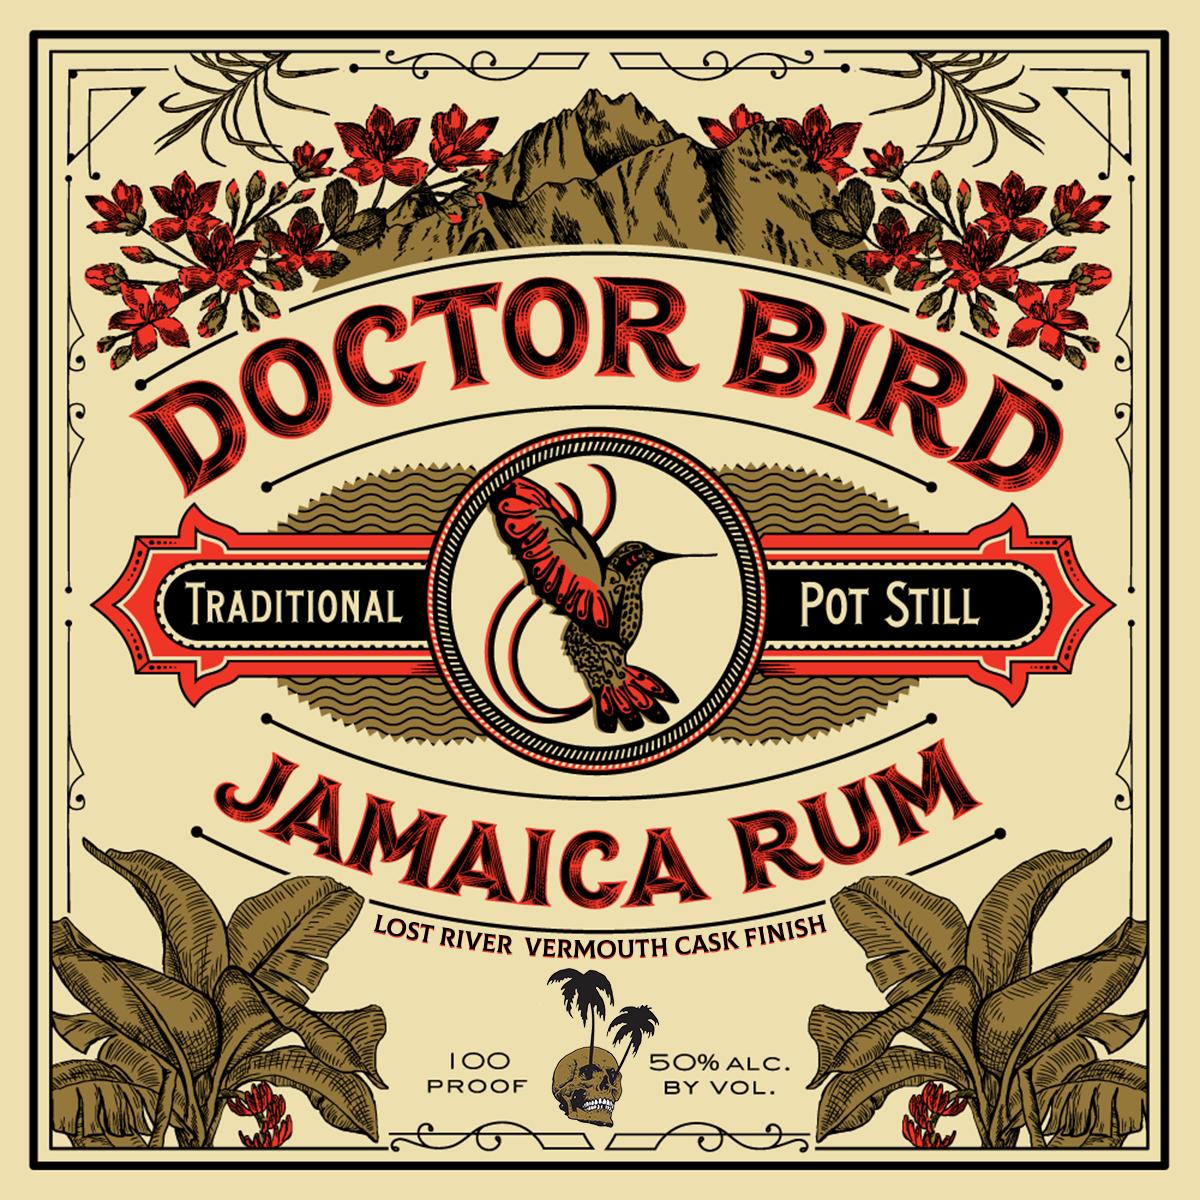 Lost River Vermouth Cask Doctor Bird Shot (50 ML)